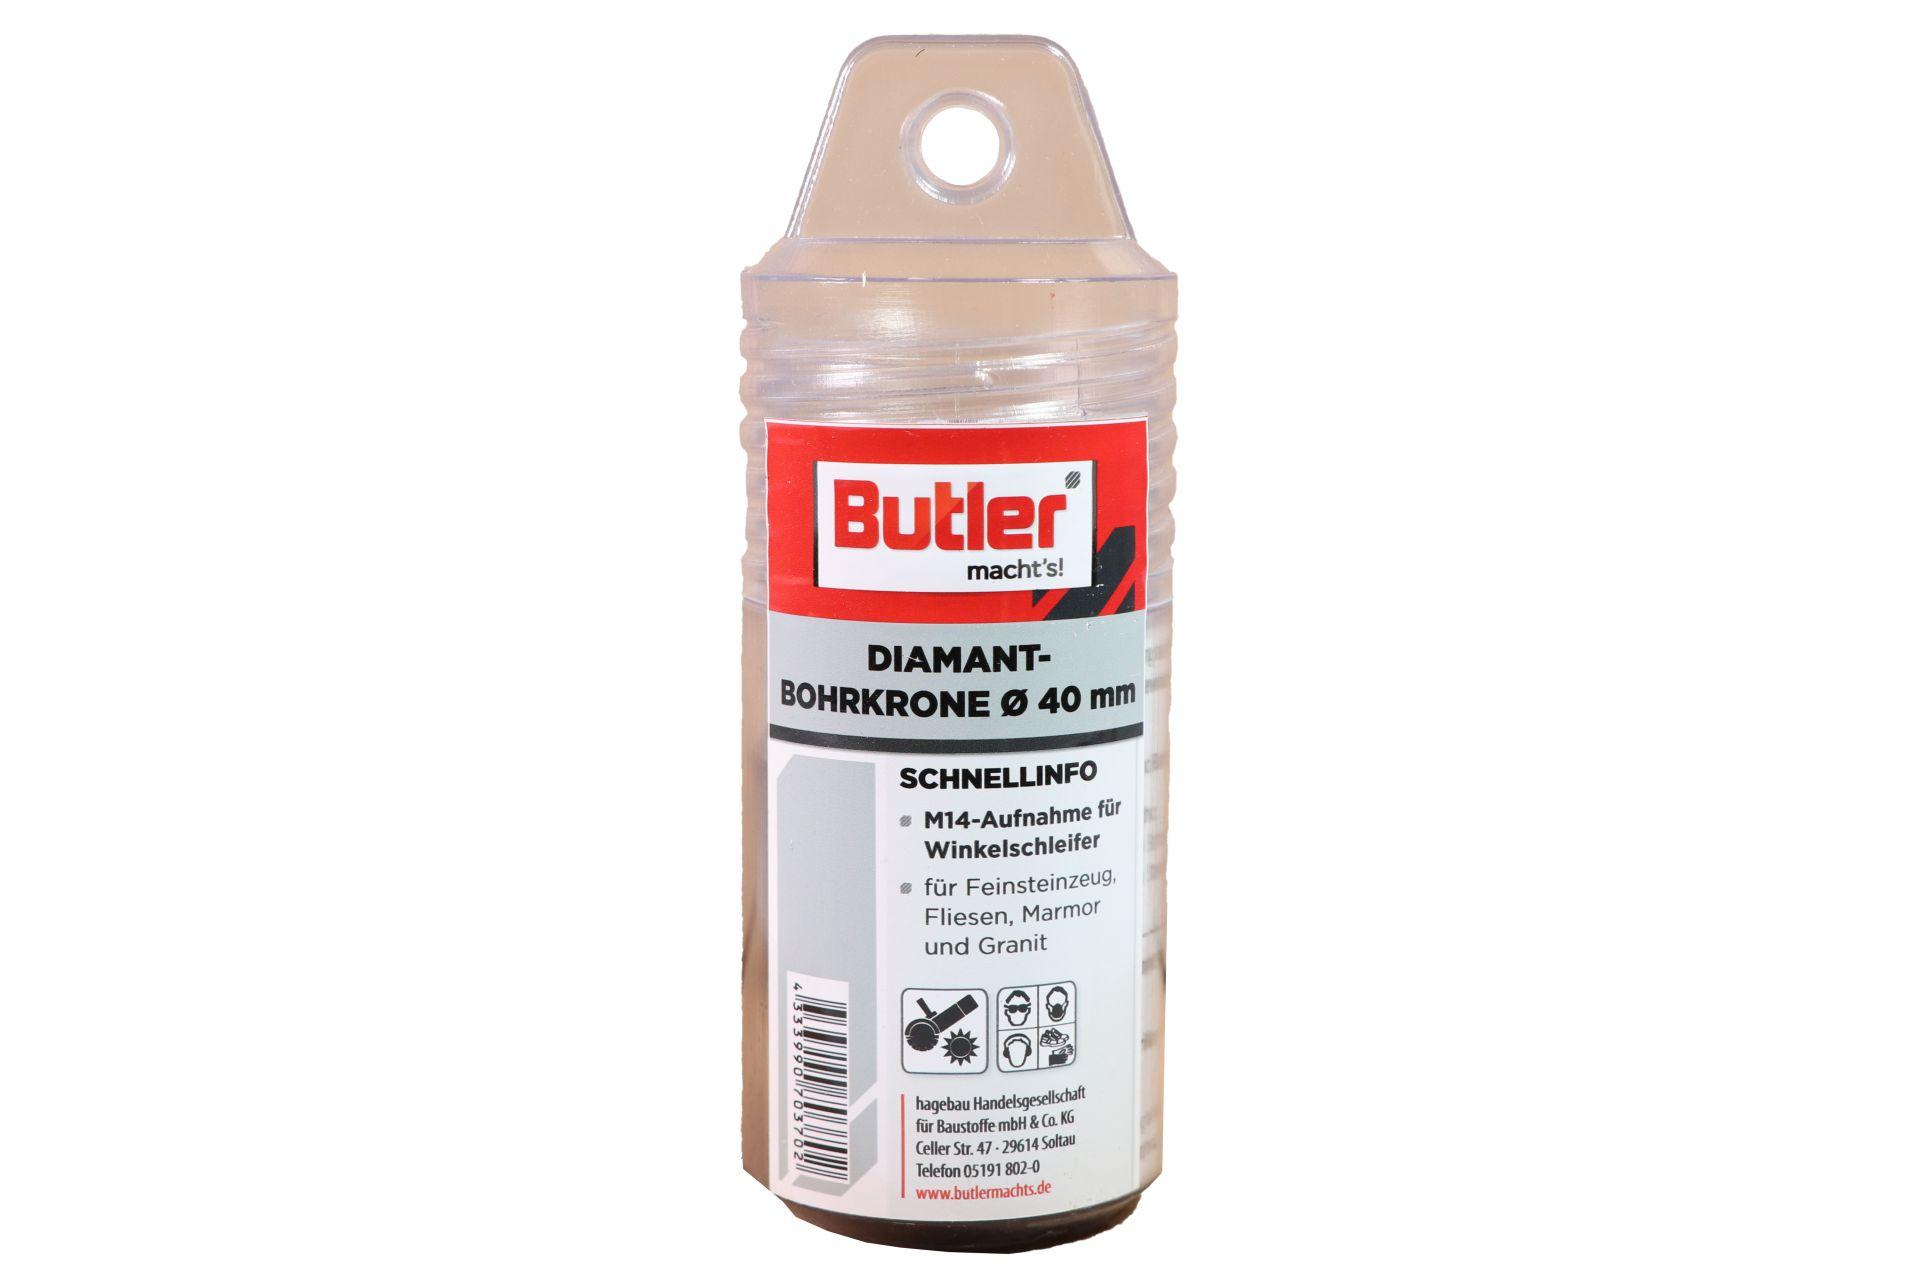 Butler macht's! Diamant-Bohrkrone, Ø 40 mm, Aufnahme M14, Bohrtiefe 45 mm